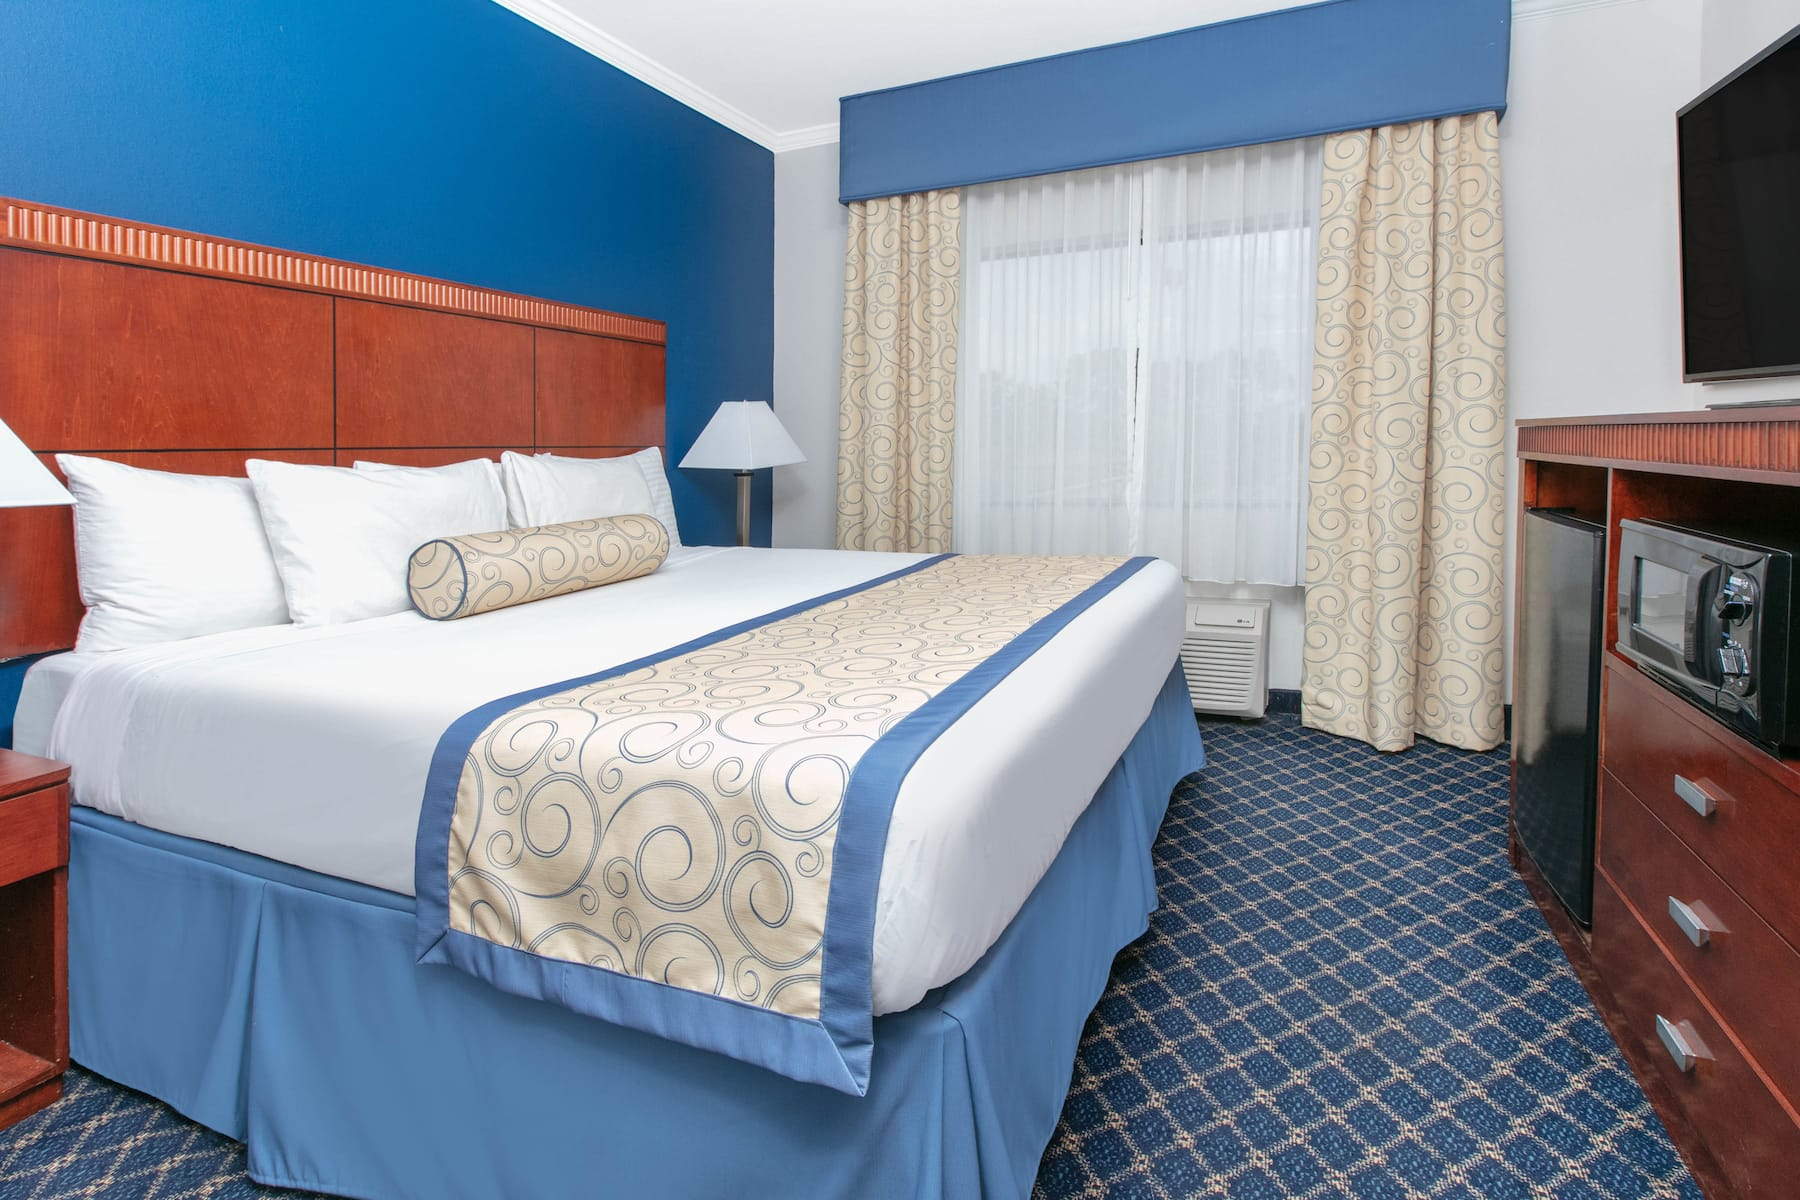 Baymont By Wyndham Mccomb Mccomb Ms Hotels